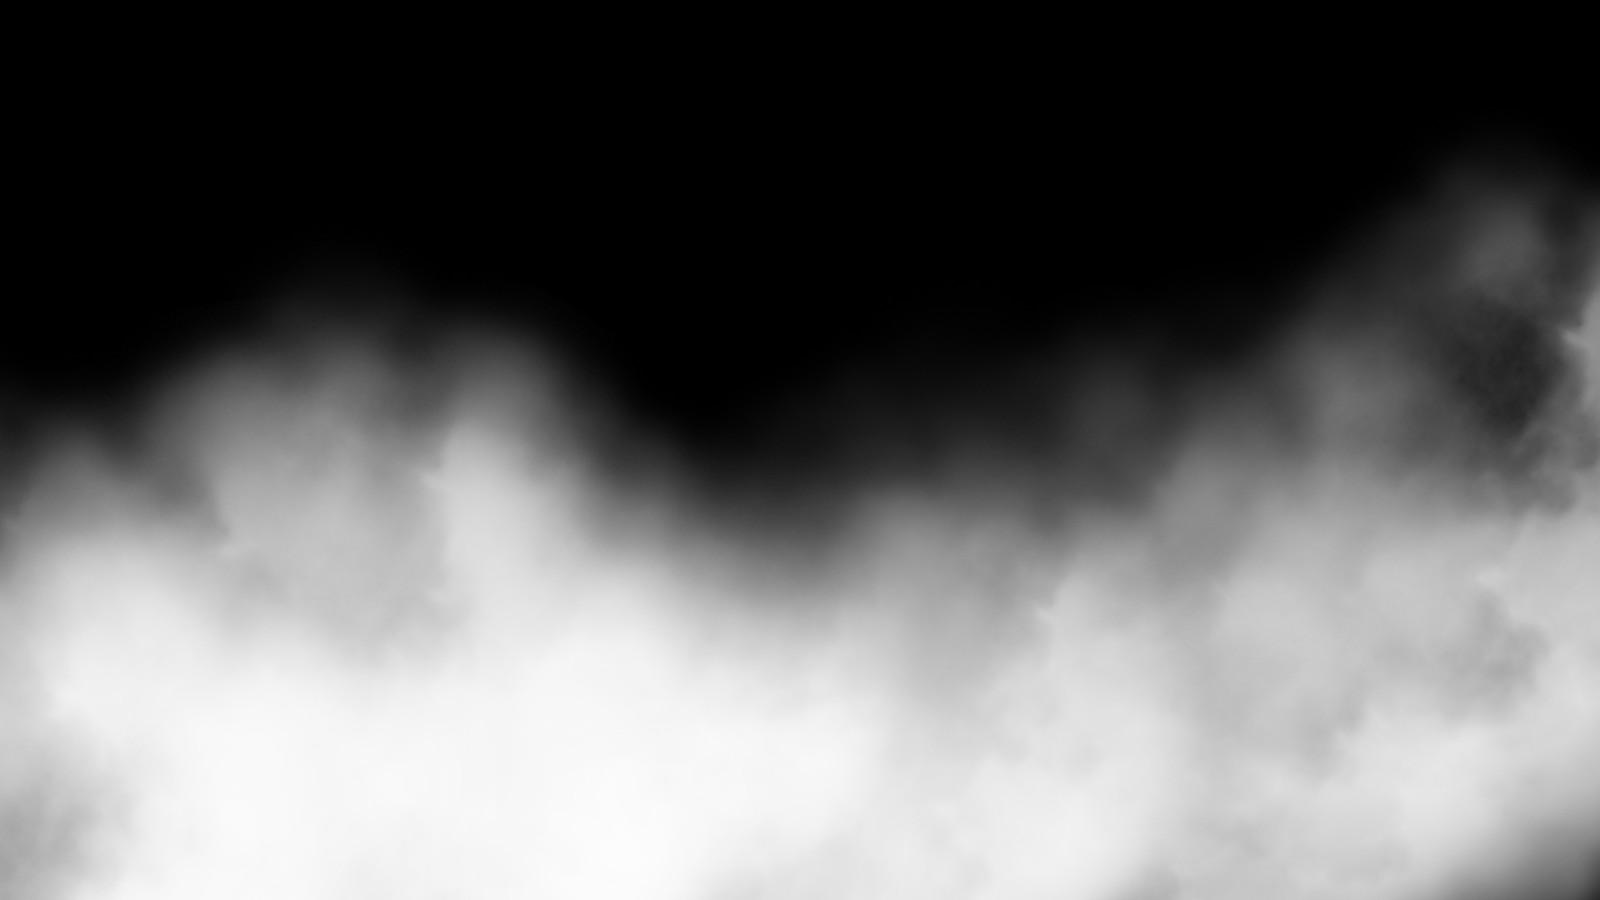 0202_BG_mg mist.png.